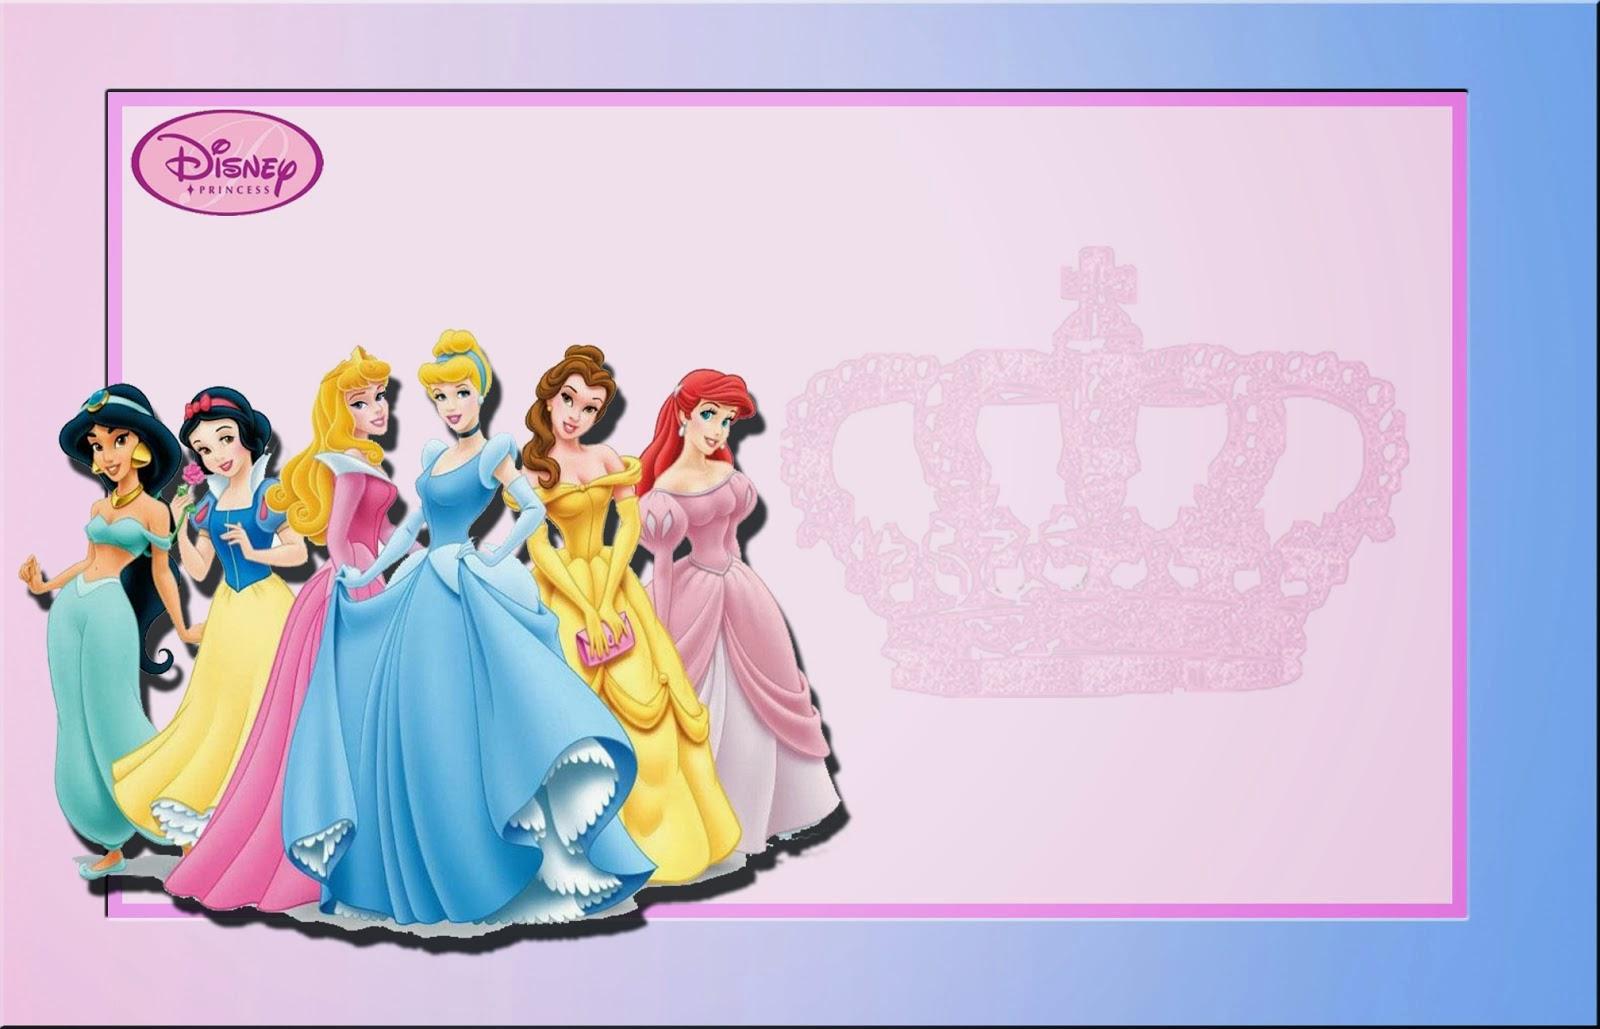 Disney Princess: Free Printable Invitations Or Photo Frames. | Oh My - Disney Princess Free Printable Invitations